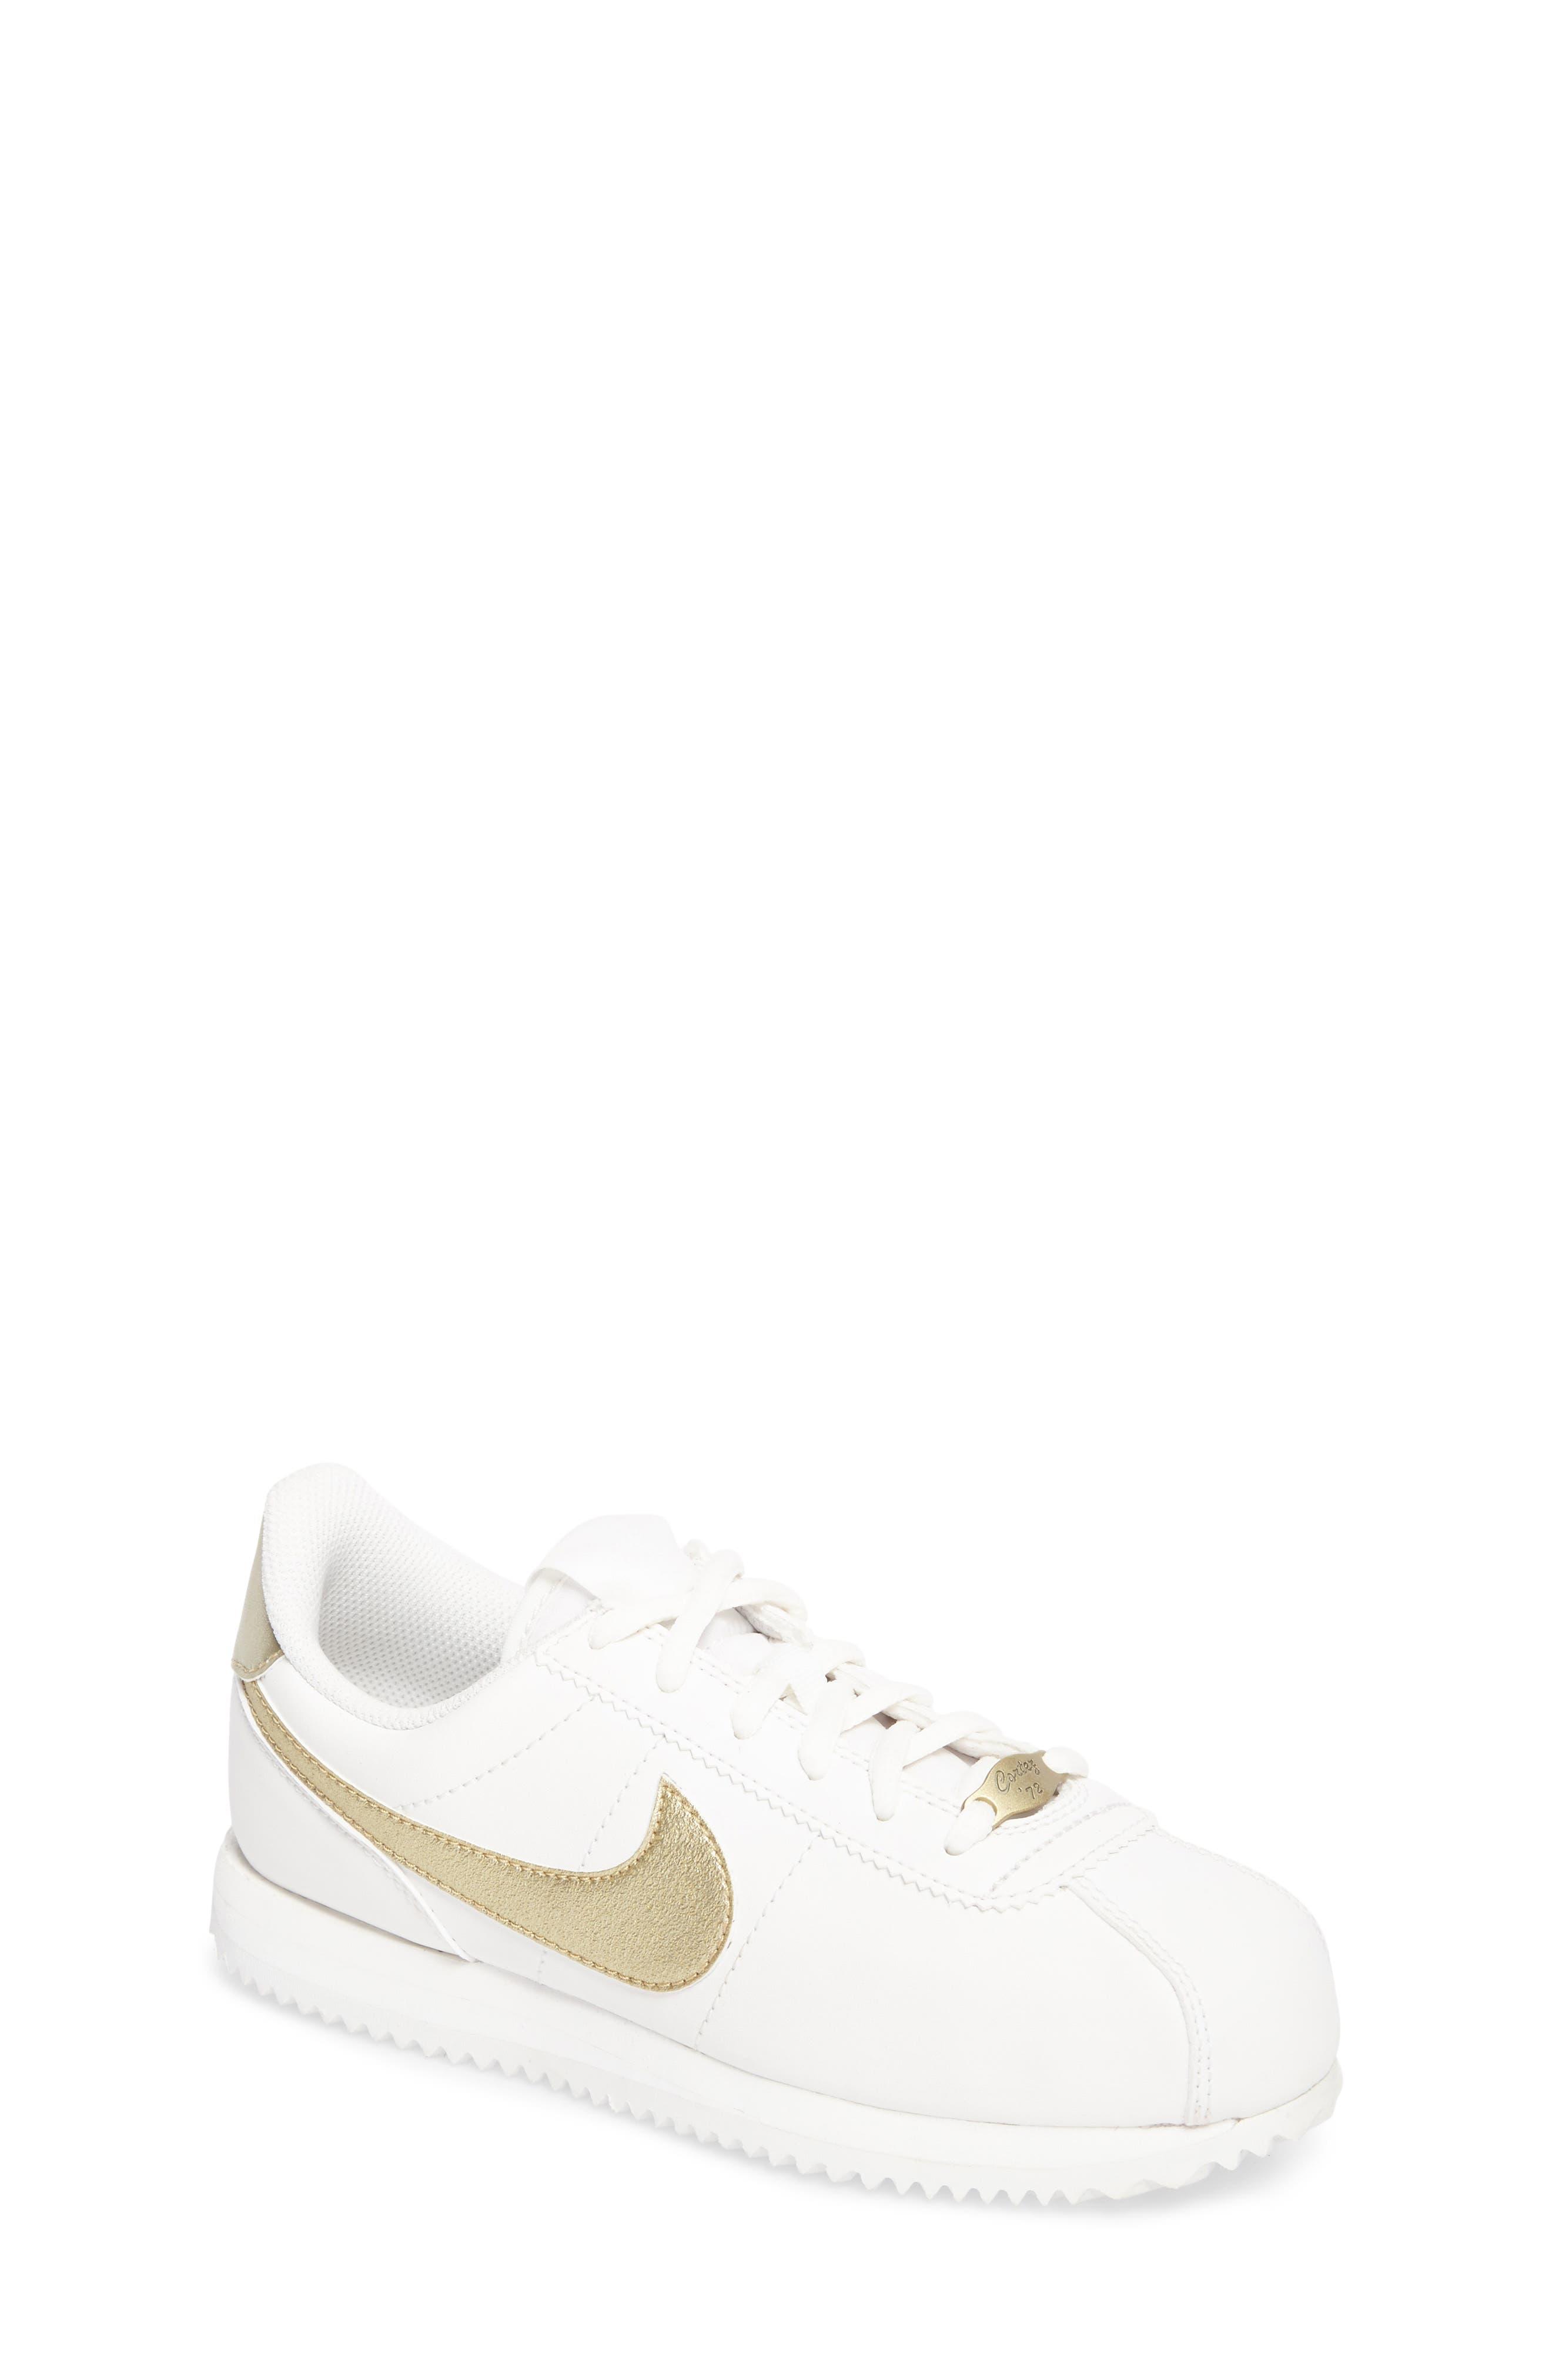 Main Image - Nike Cortez Basic SL Sneaker (Toddler, Little Kid & Big Kid)